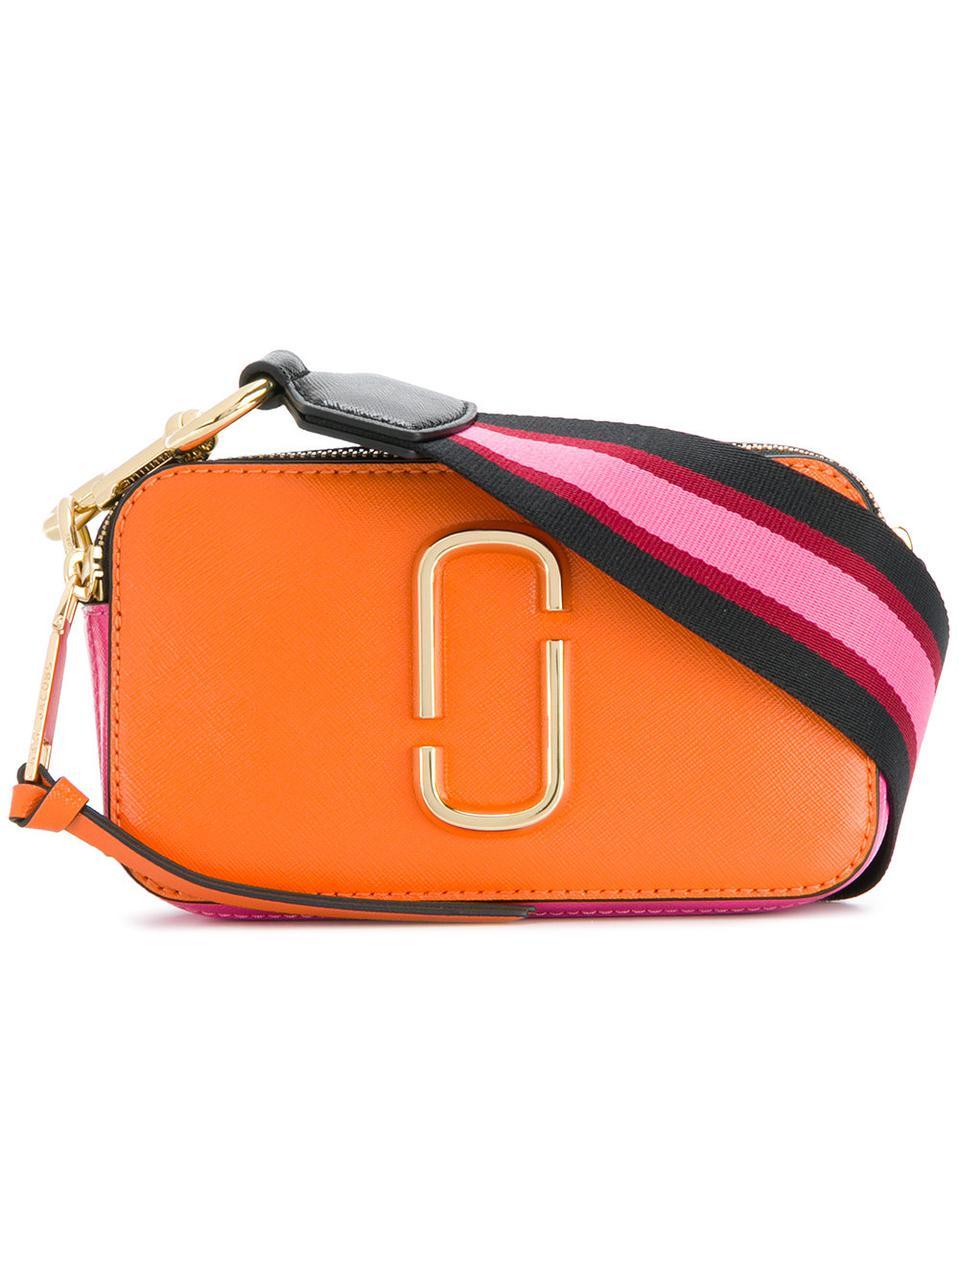 1142e9b09da9 MARC JACOBS маленькая сумка Snapshot Camera, цена 2 599 грн., купить ...